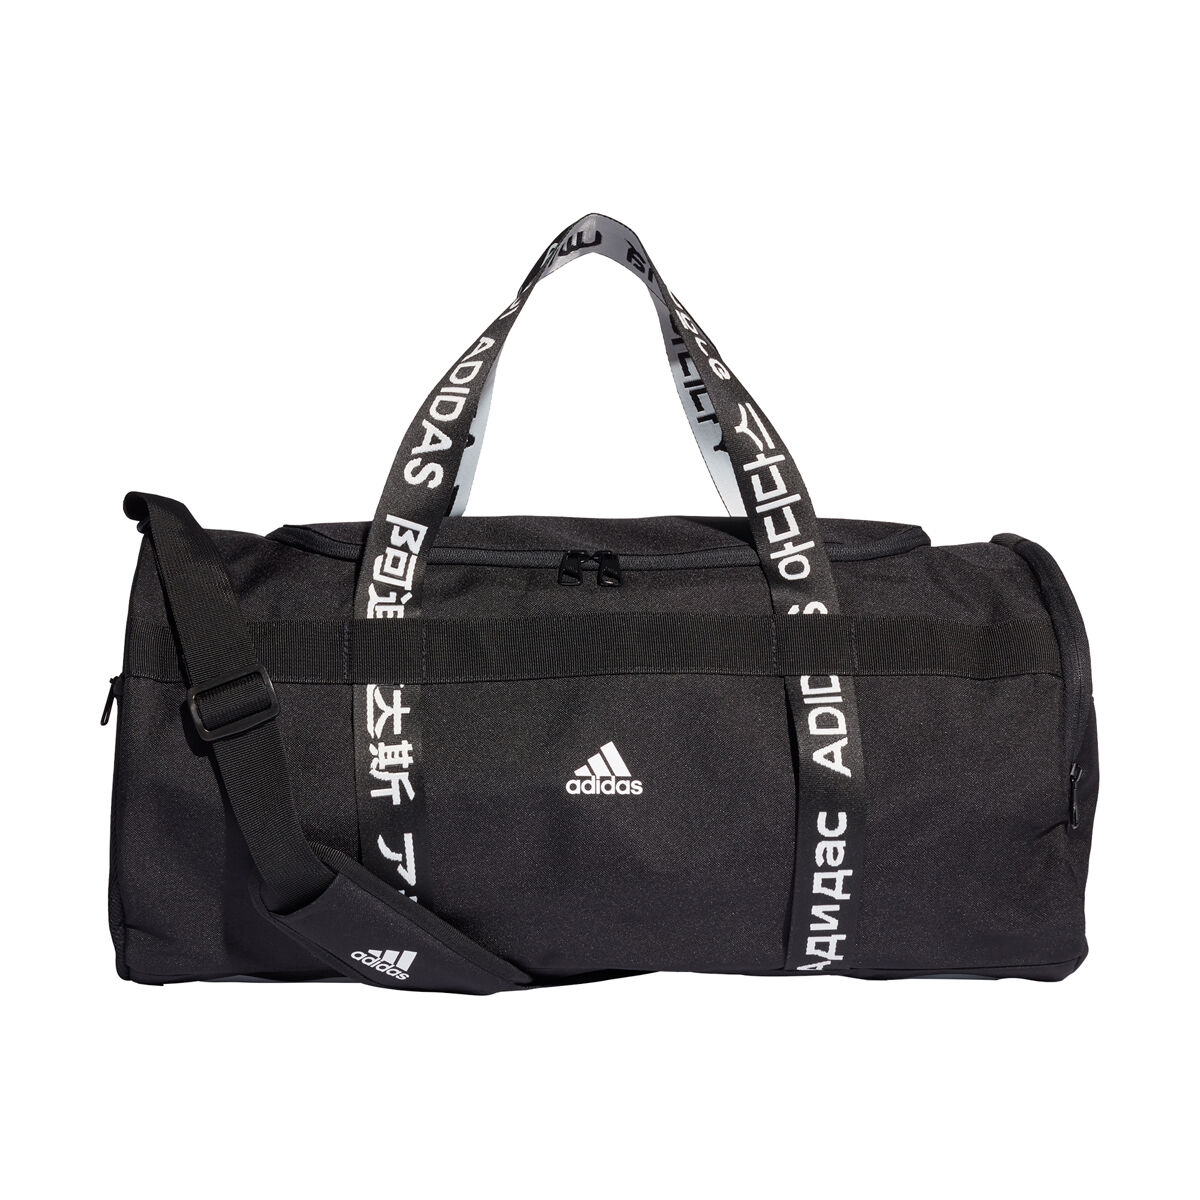 adidas Football Team Bag BC MEDIUM BLACK RUGBY BAGS